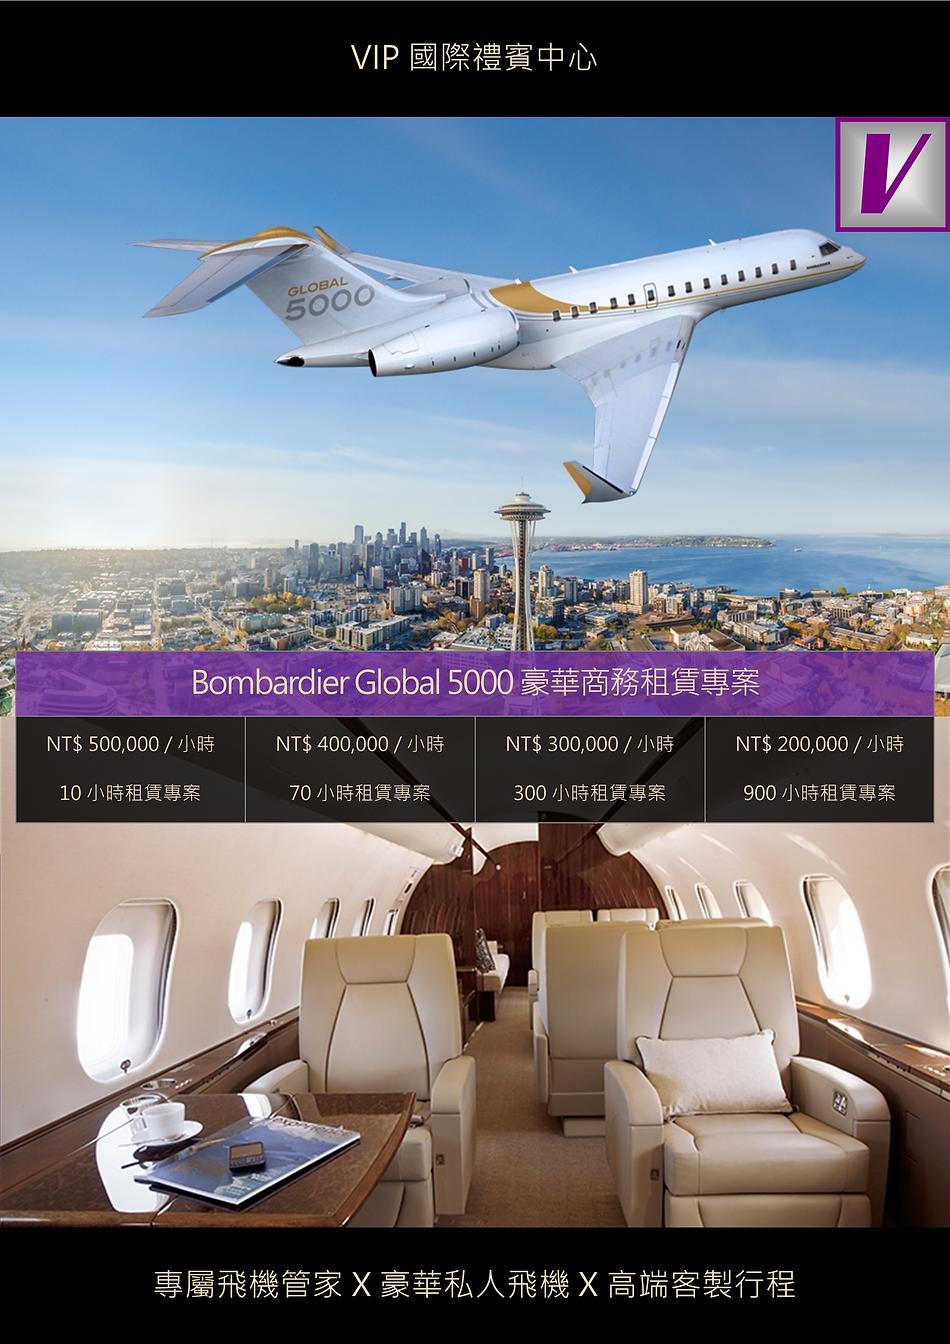 VIP國際禮賓中心 BOMBARDIER GLOBAL 5000 豪華商務租賃專案 DM.png